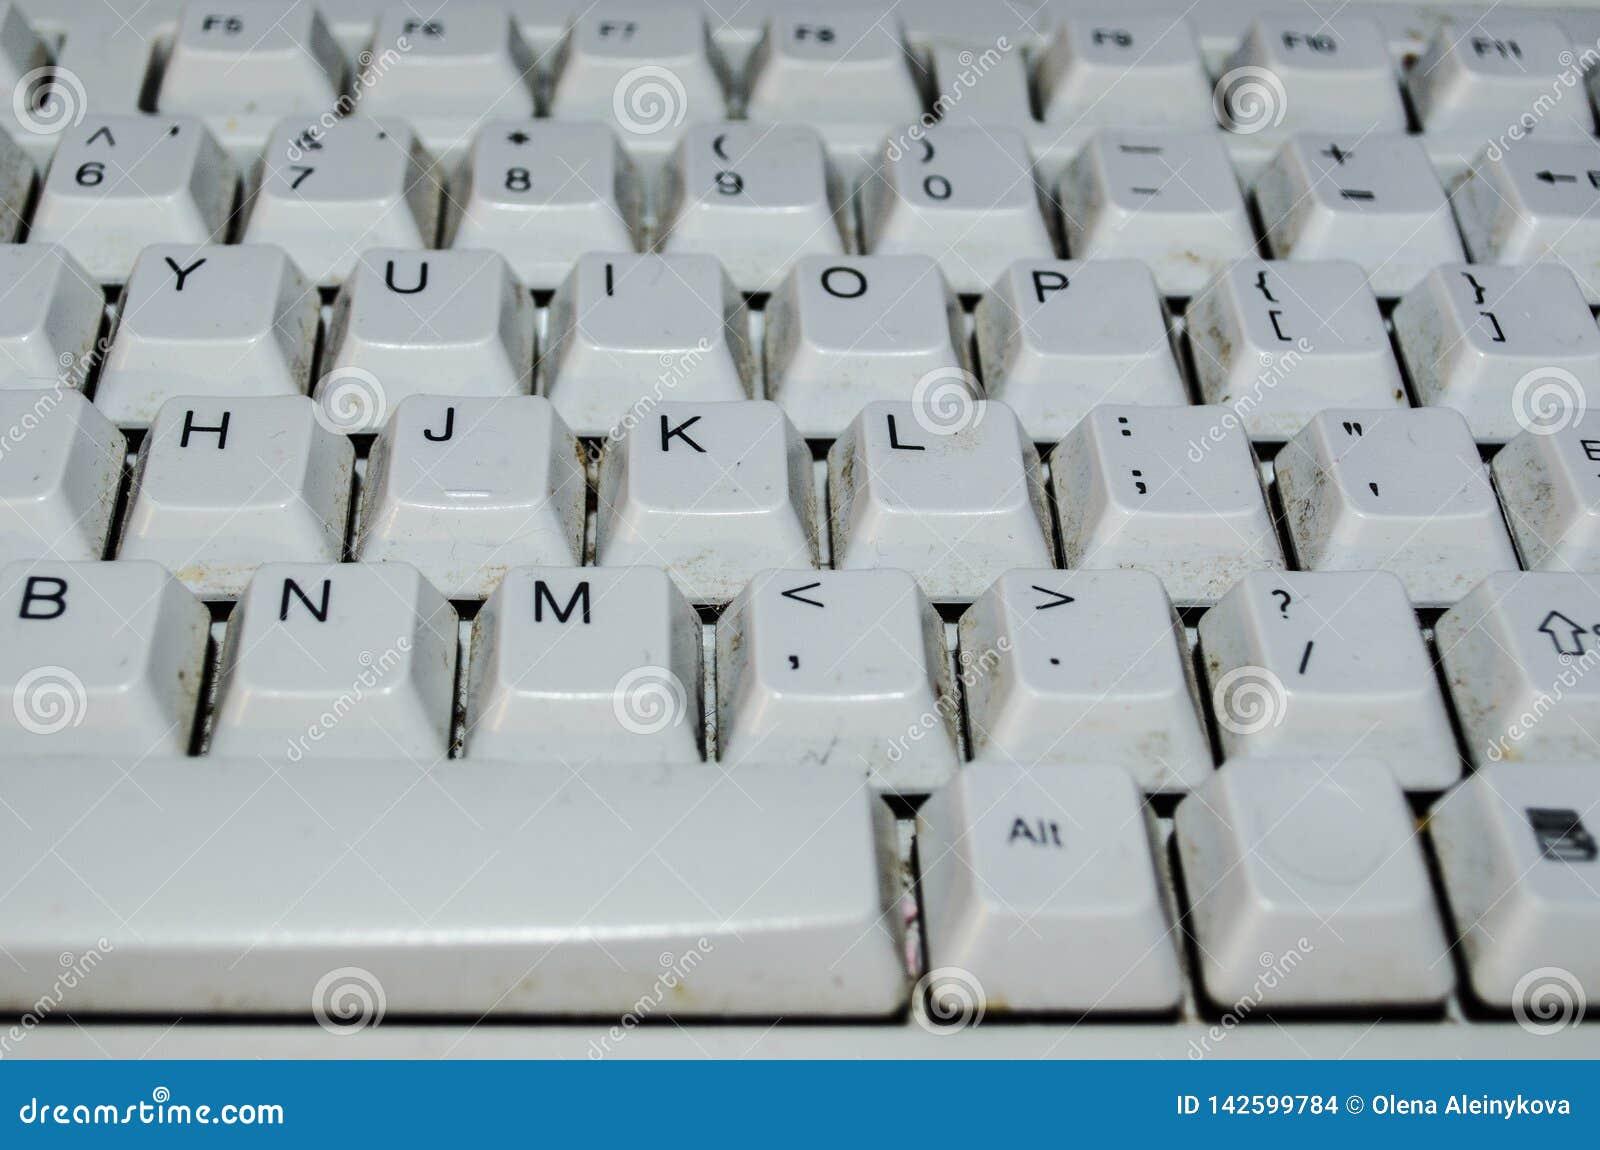 Vuil toetsenbord